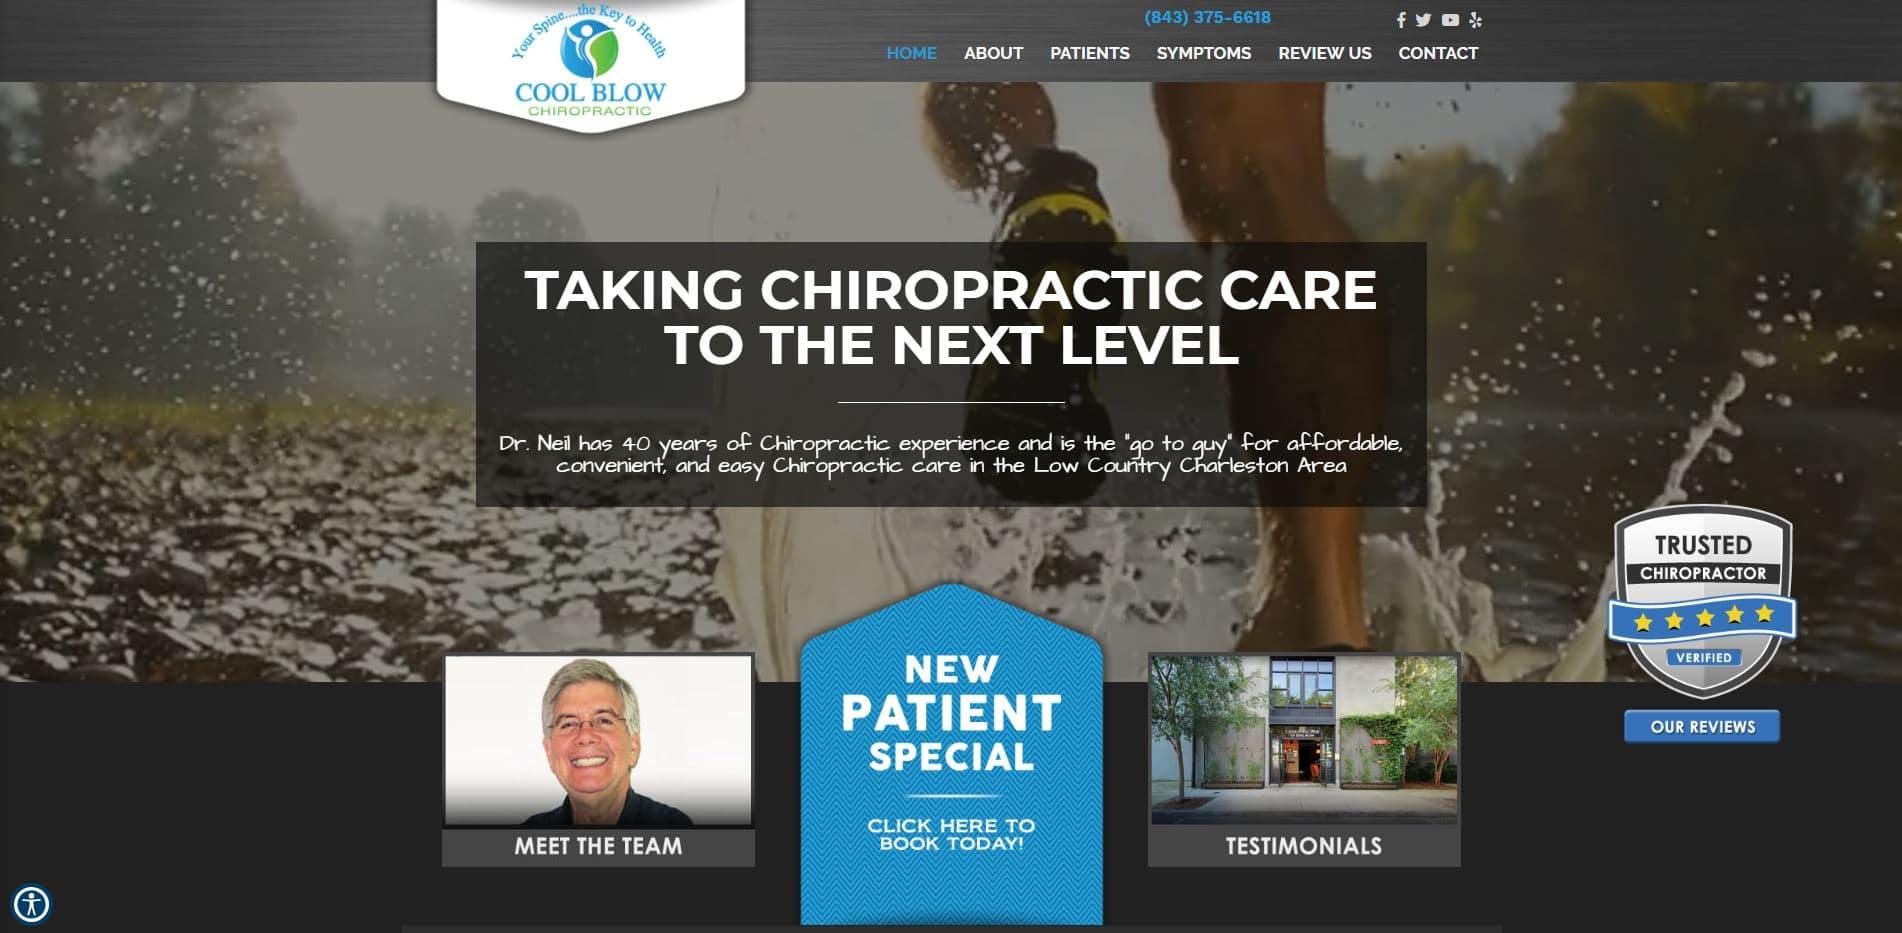 Chiropractor in Charleston